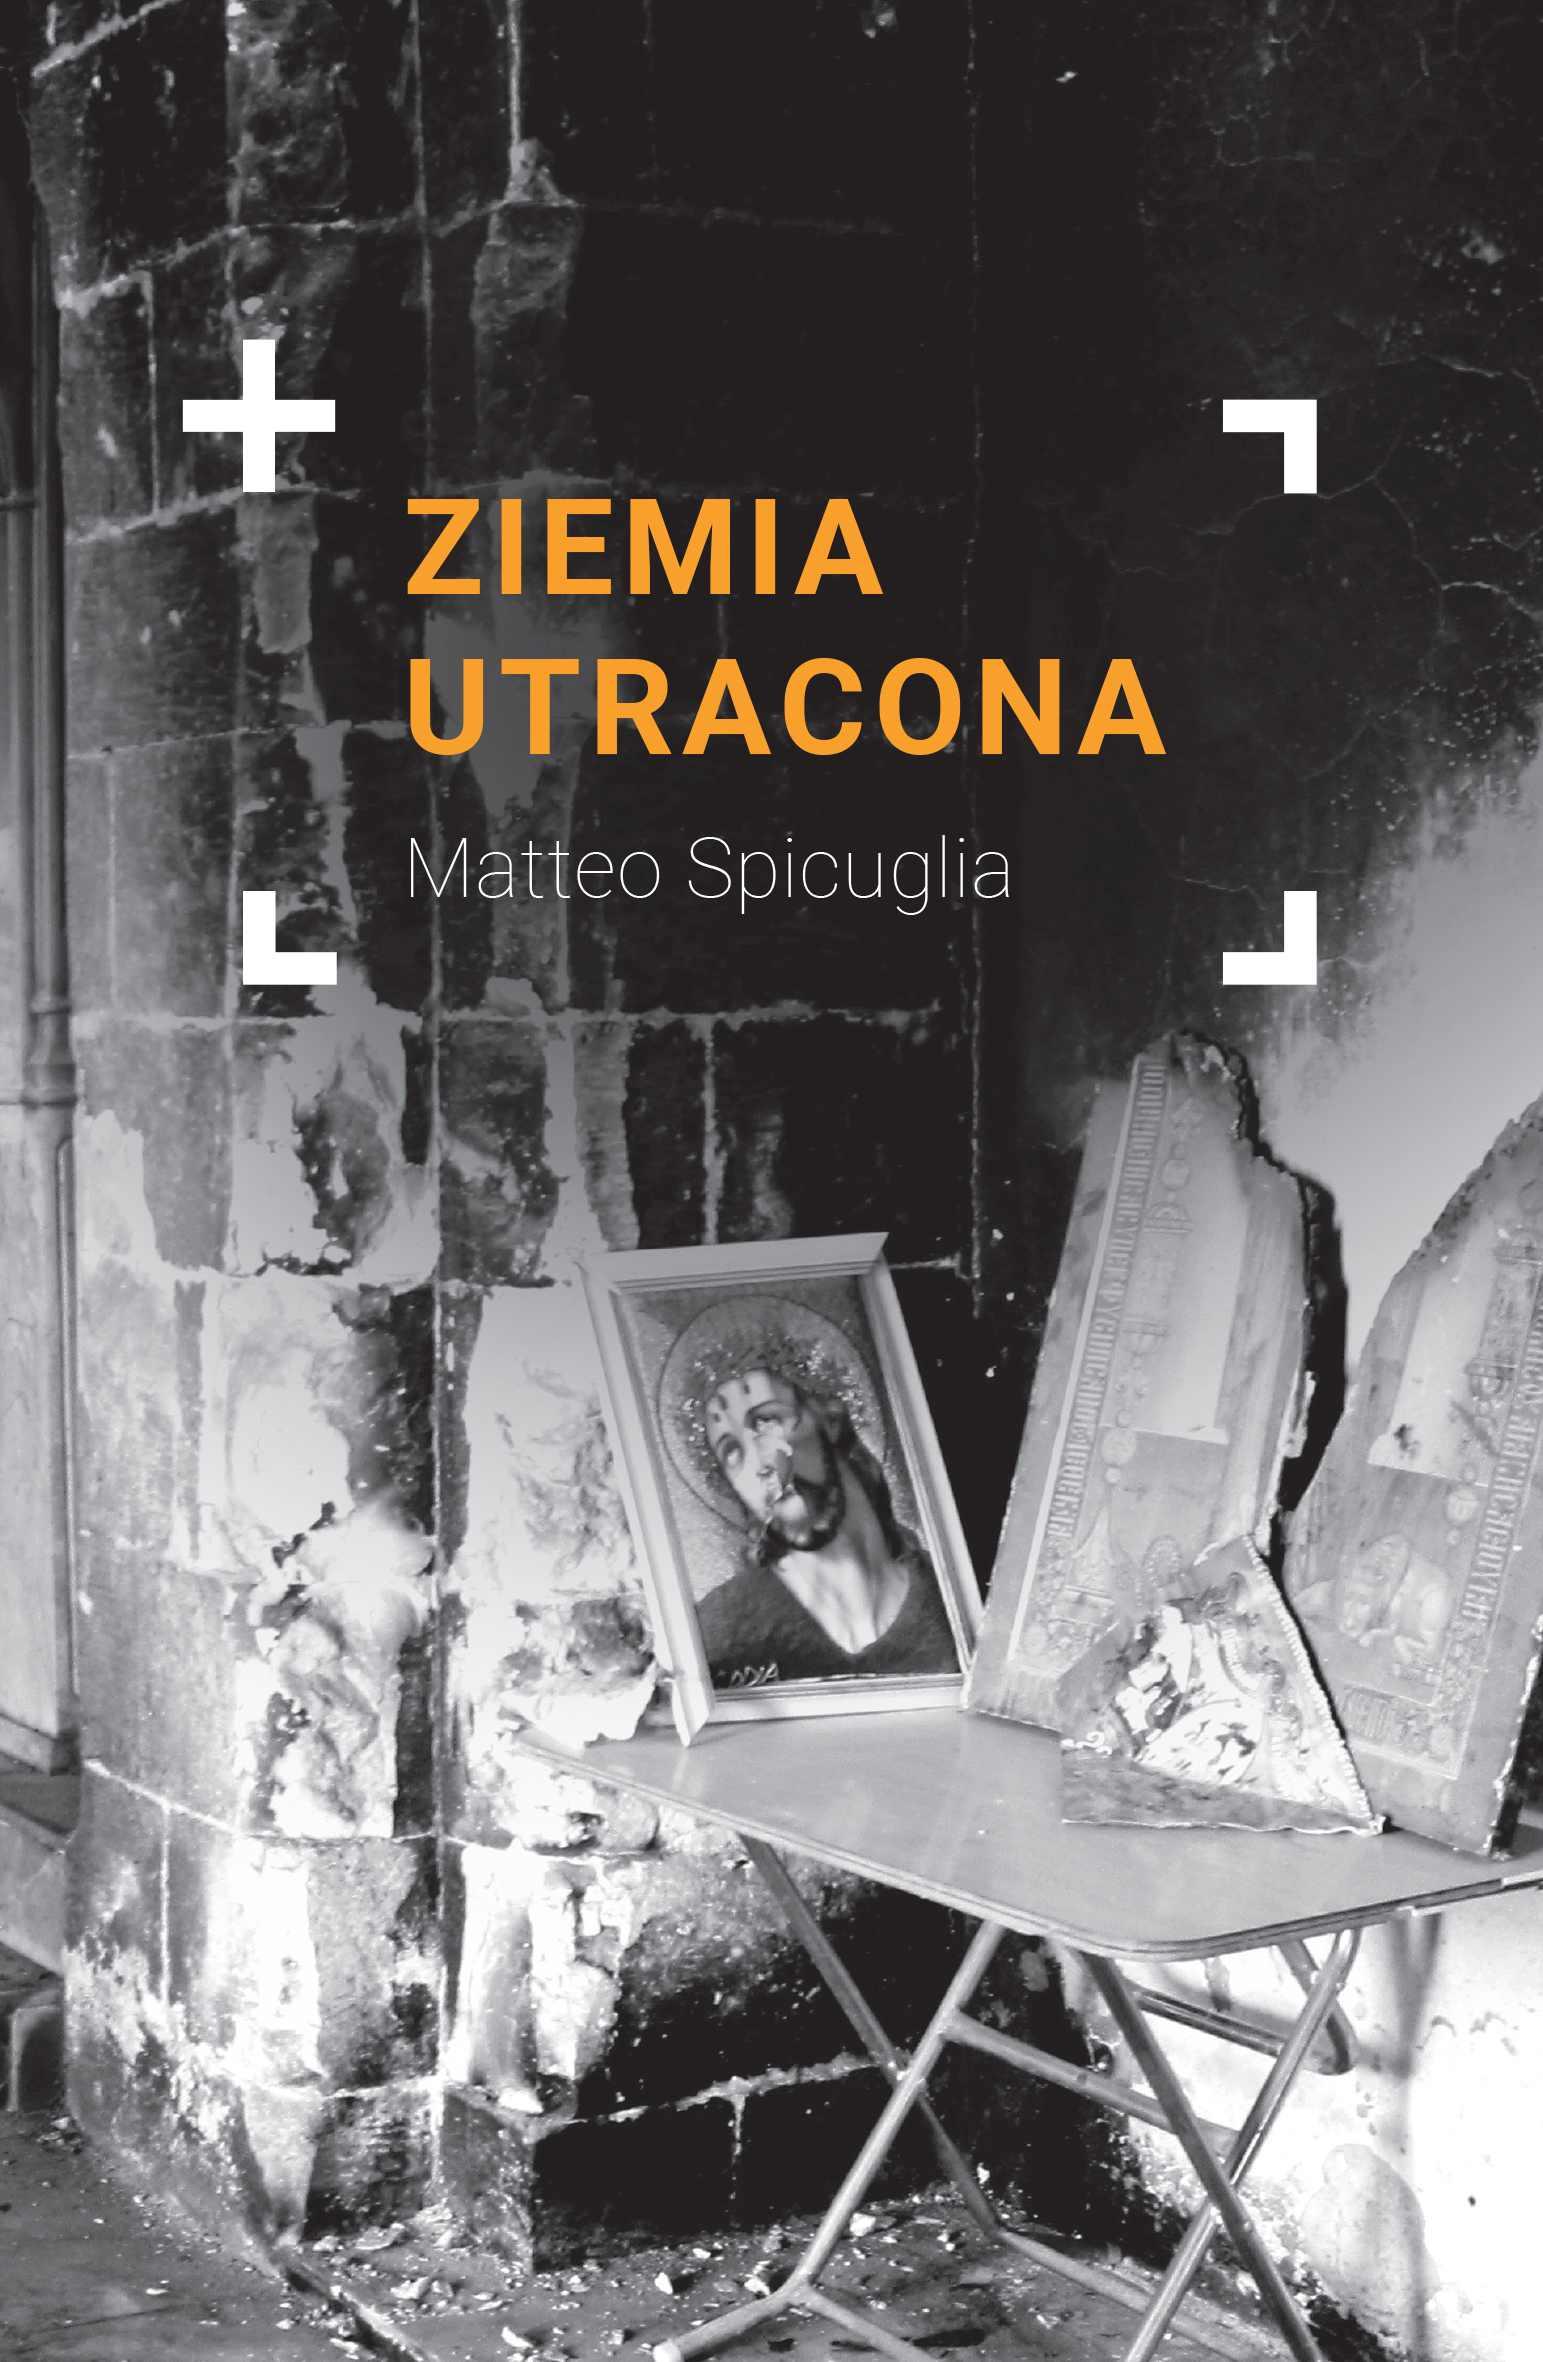 Matteo Spicuglia, Ziemia utracona